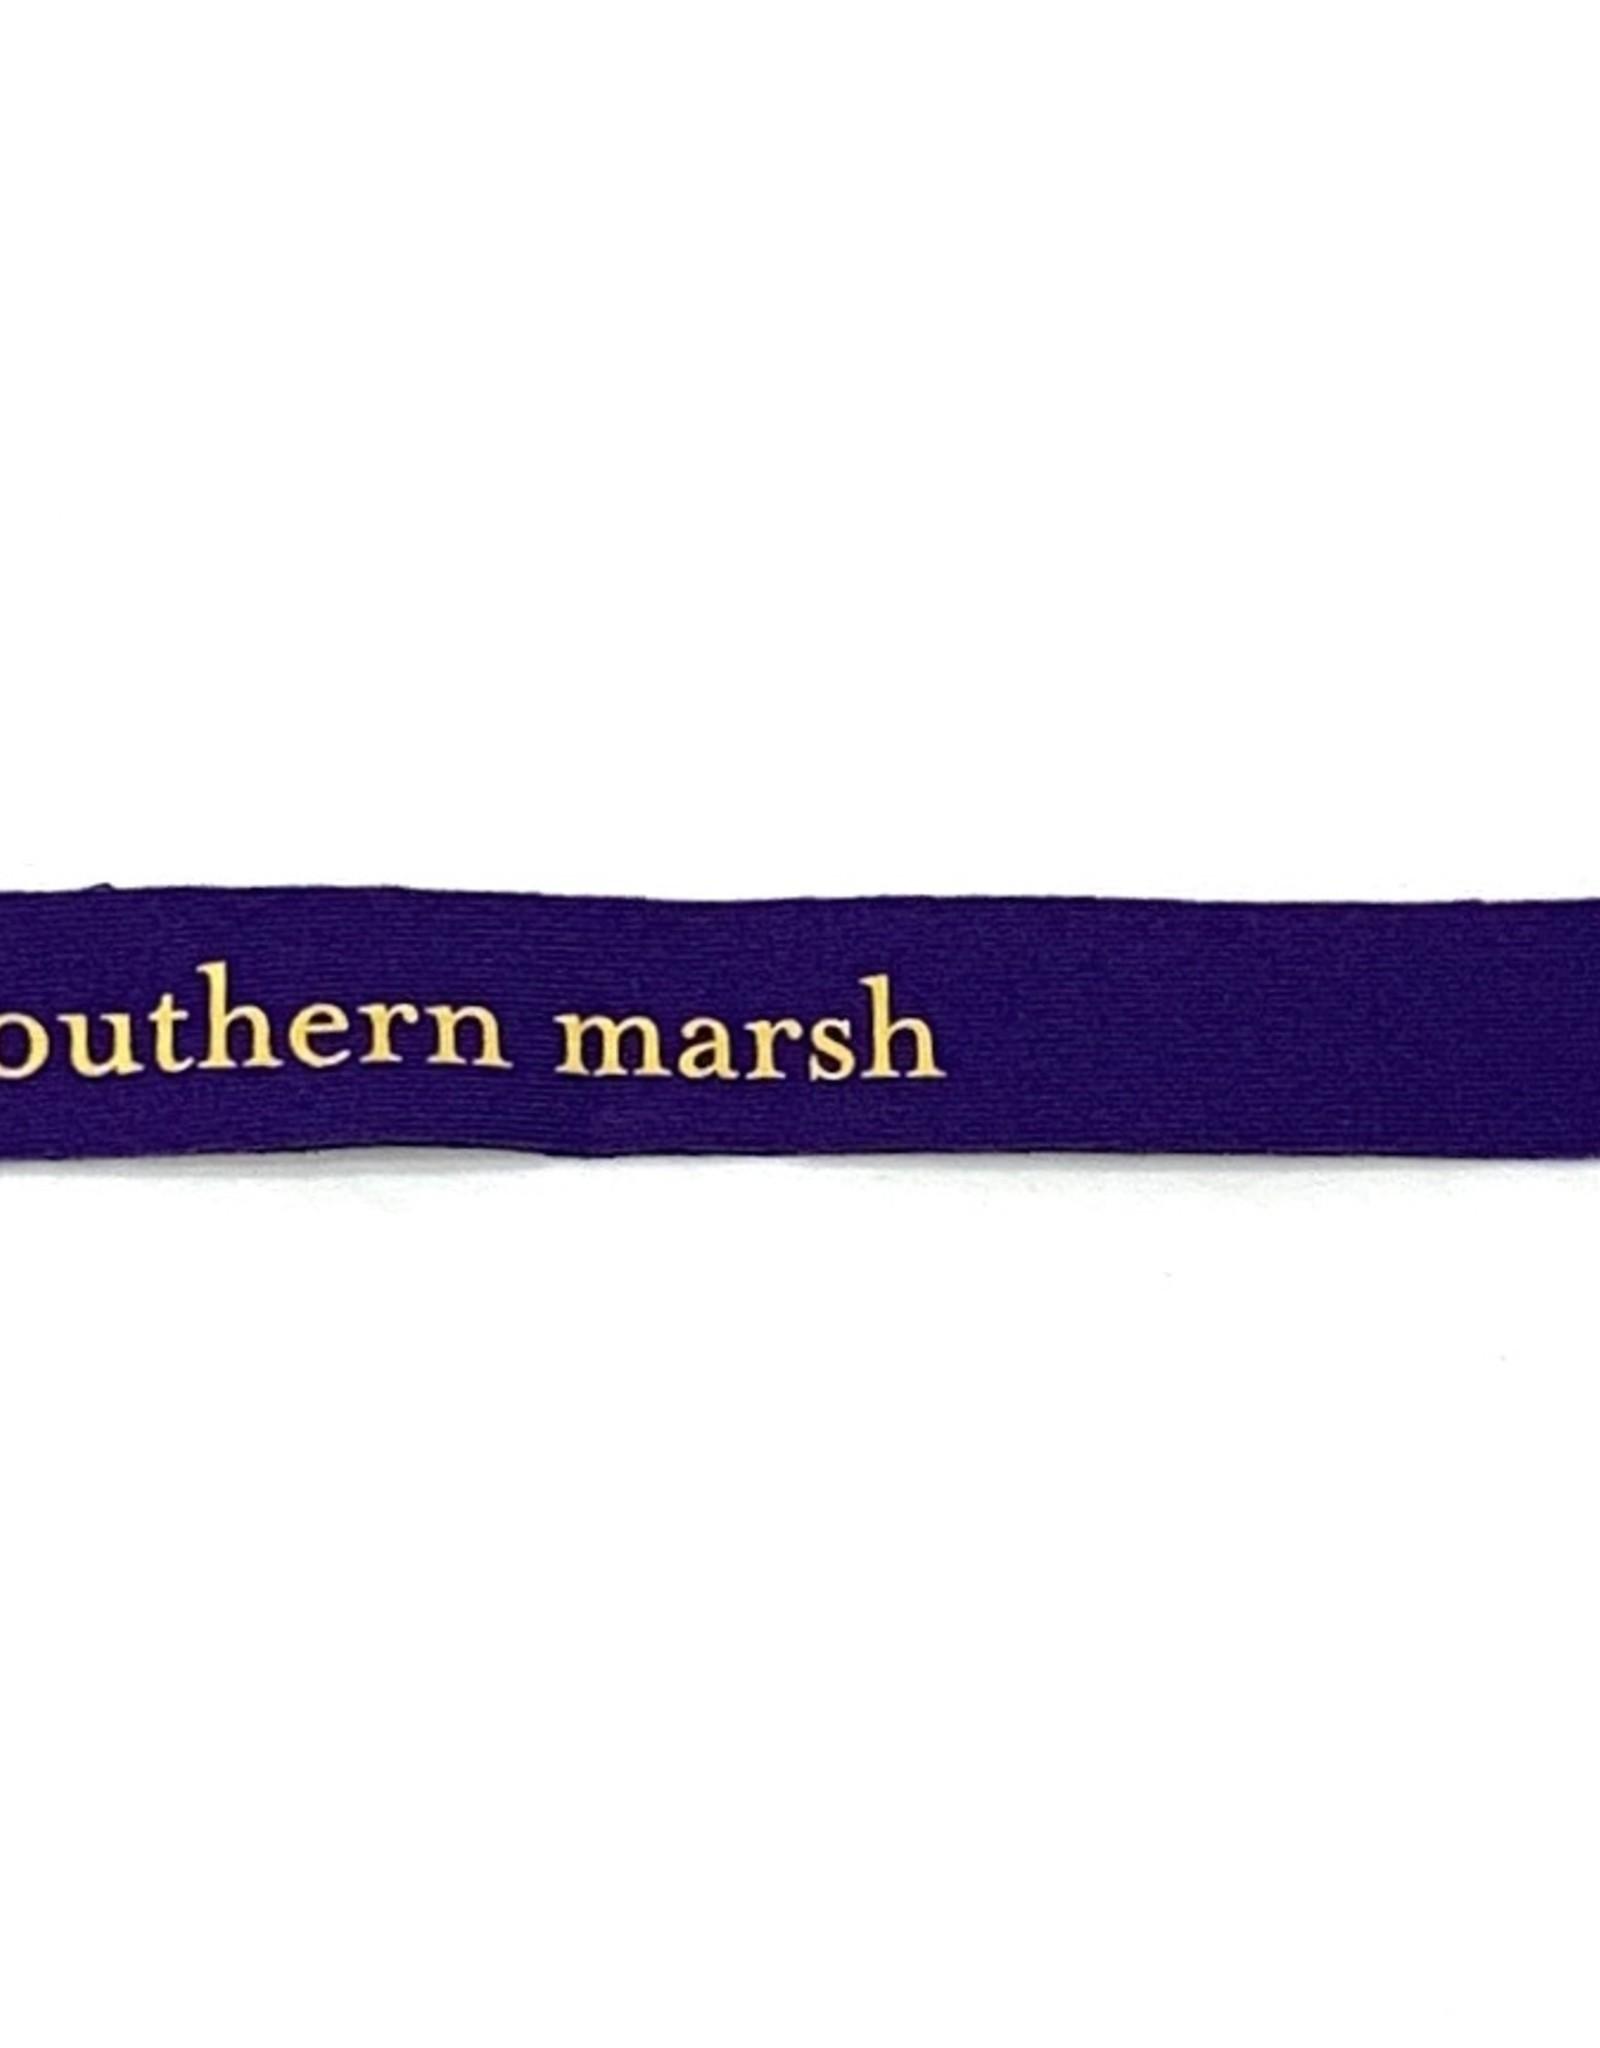 Southern Marsh Southern Marsh Sunglass Strap